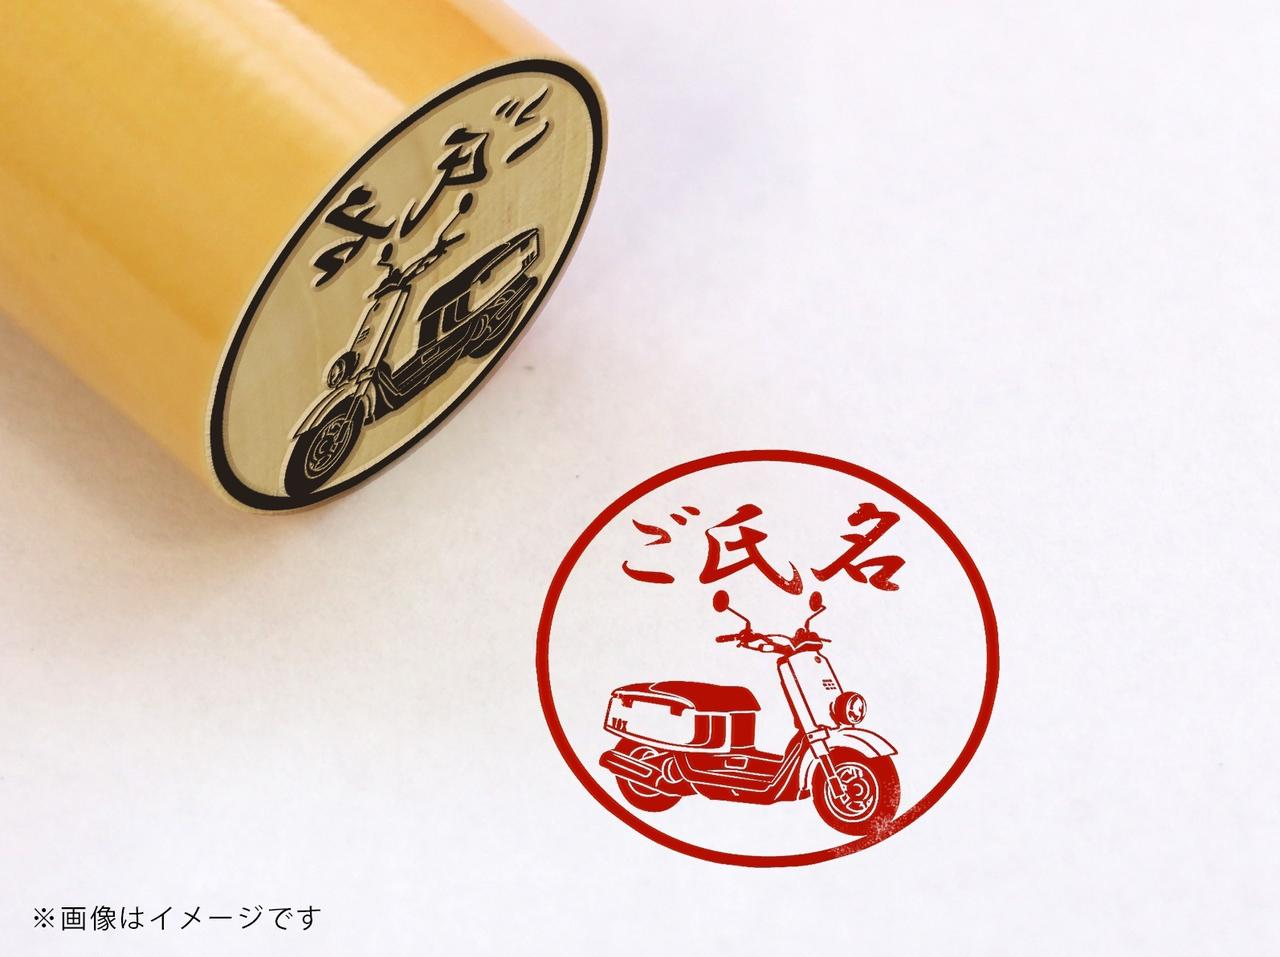 Images : 【YAMAHA】VOX デラックス・柘植丸印18mm